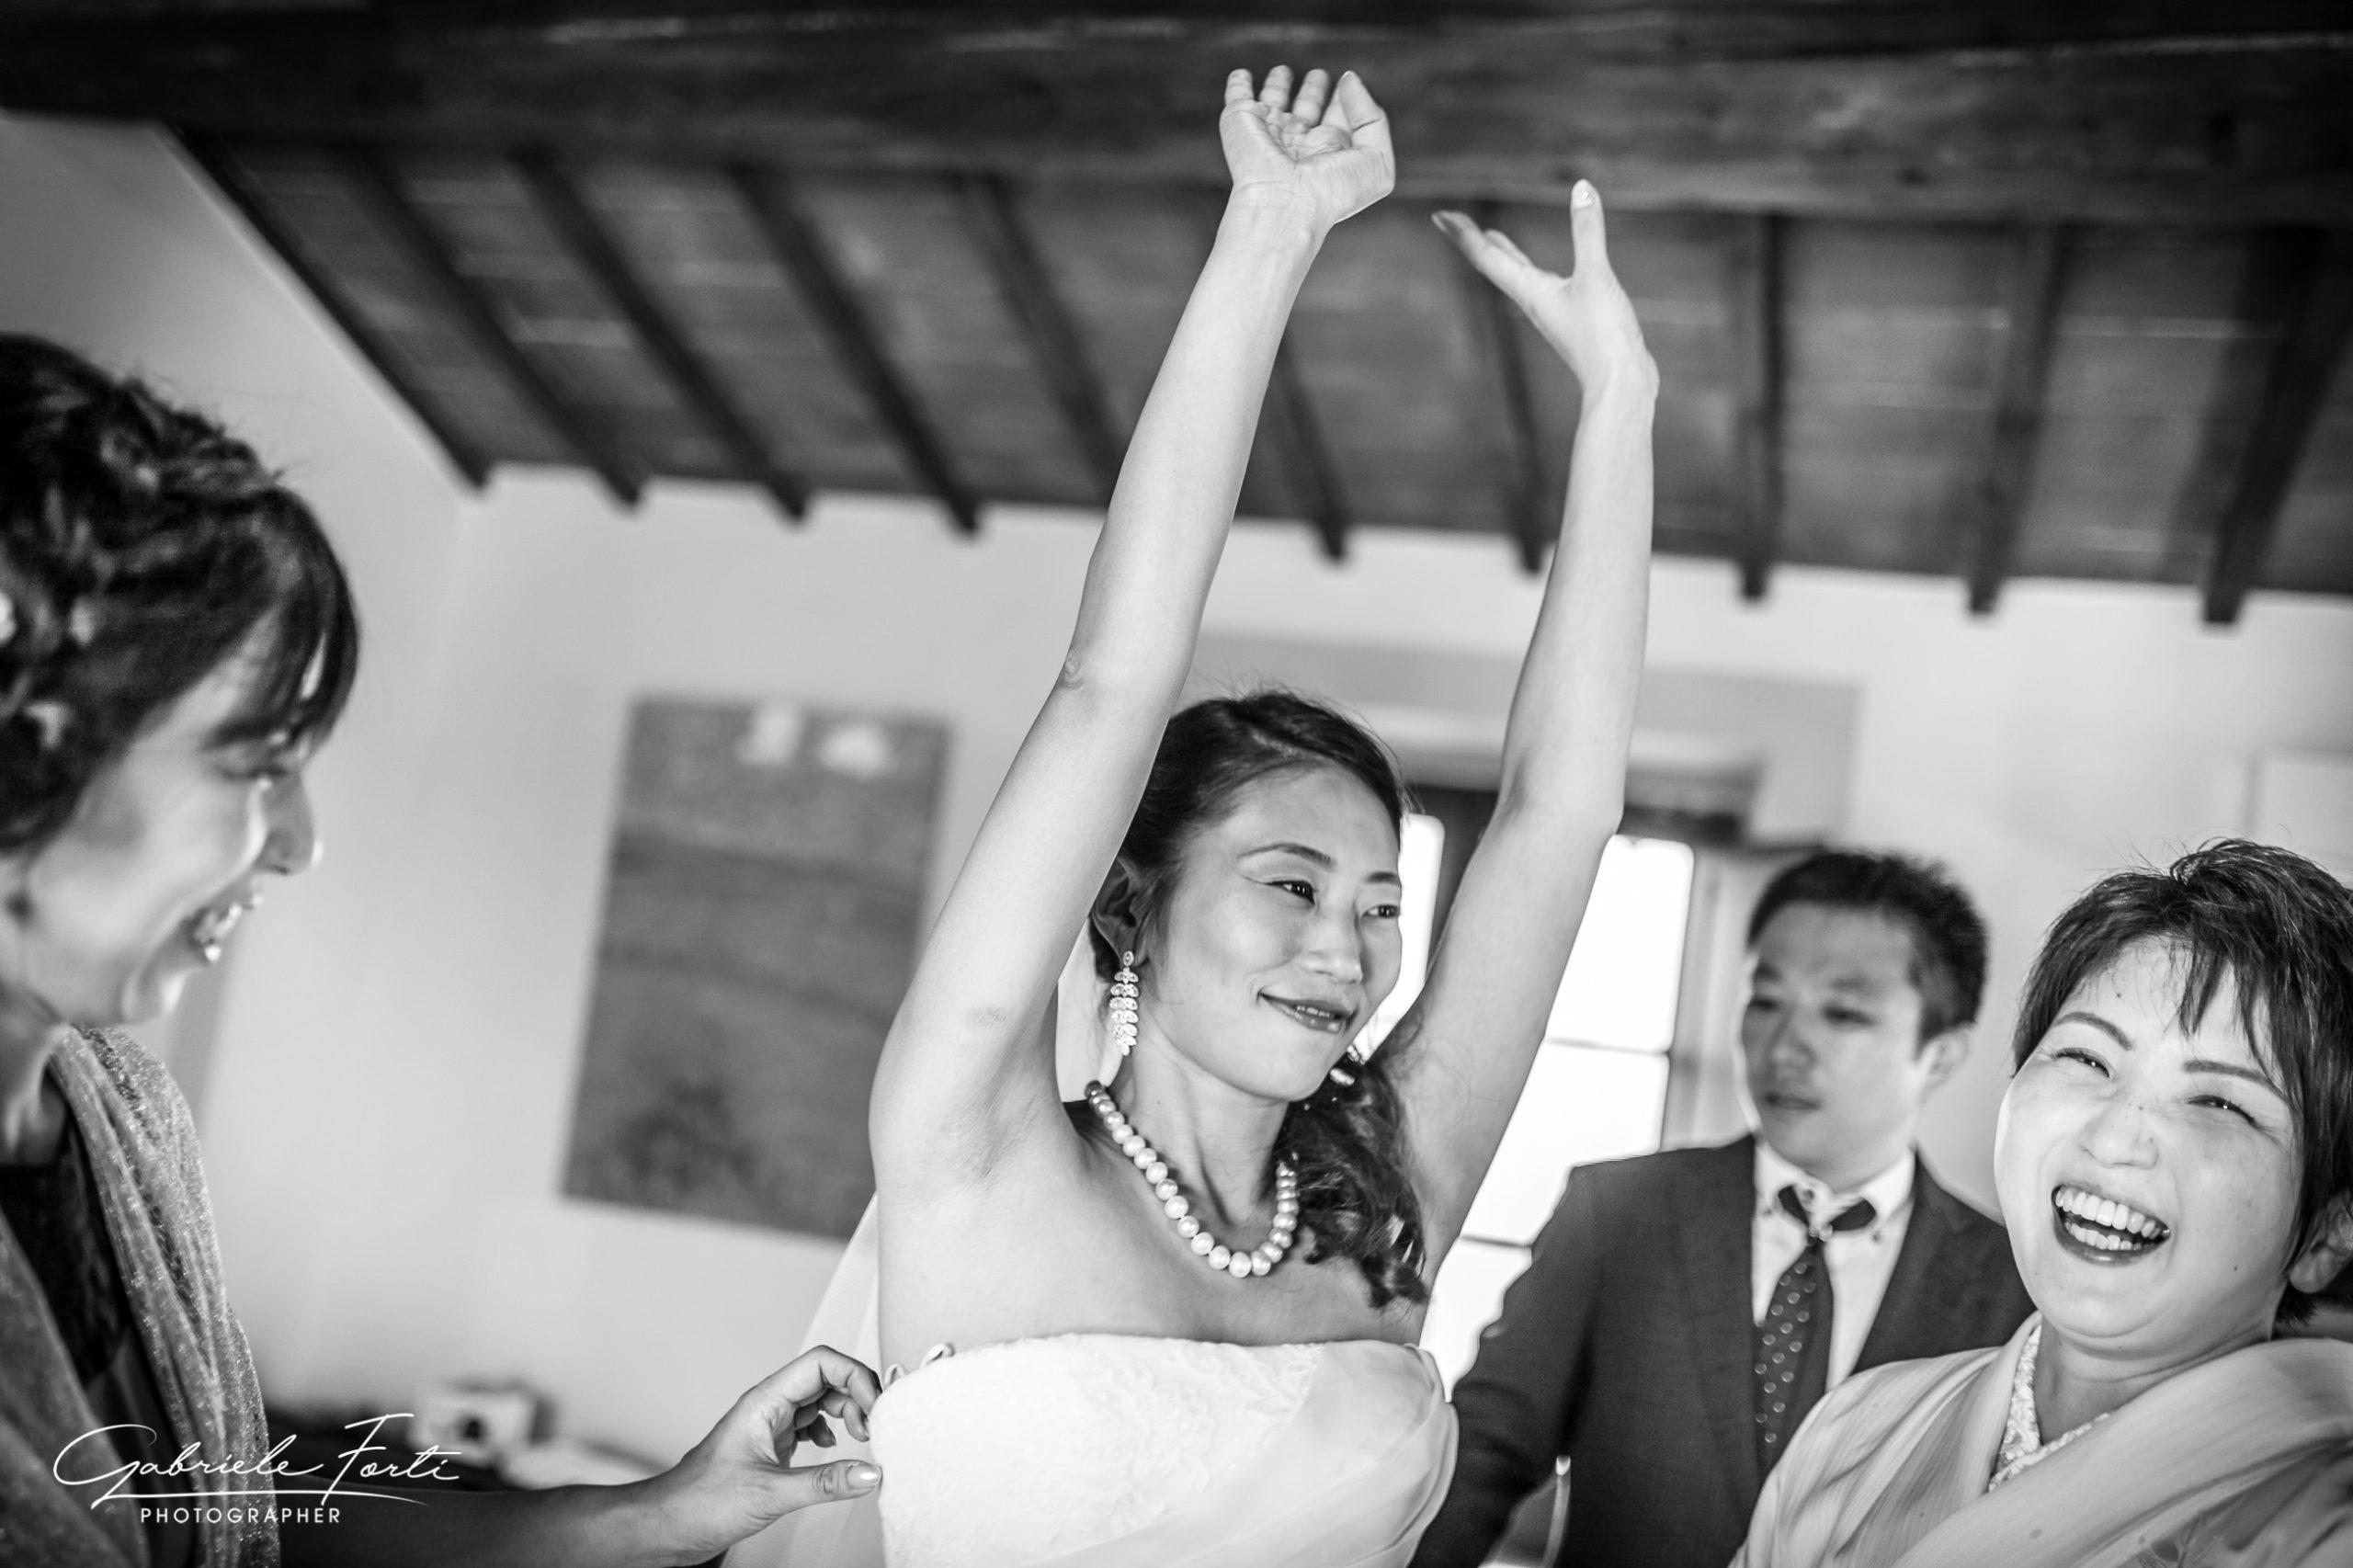 wedding-japan-tuscany-locanda-in-tuscany-photographer-siena-foto-forti-gabriele-6